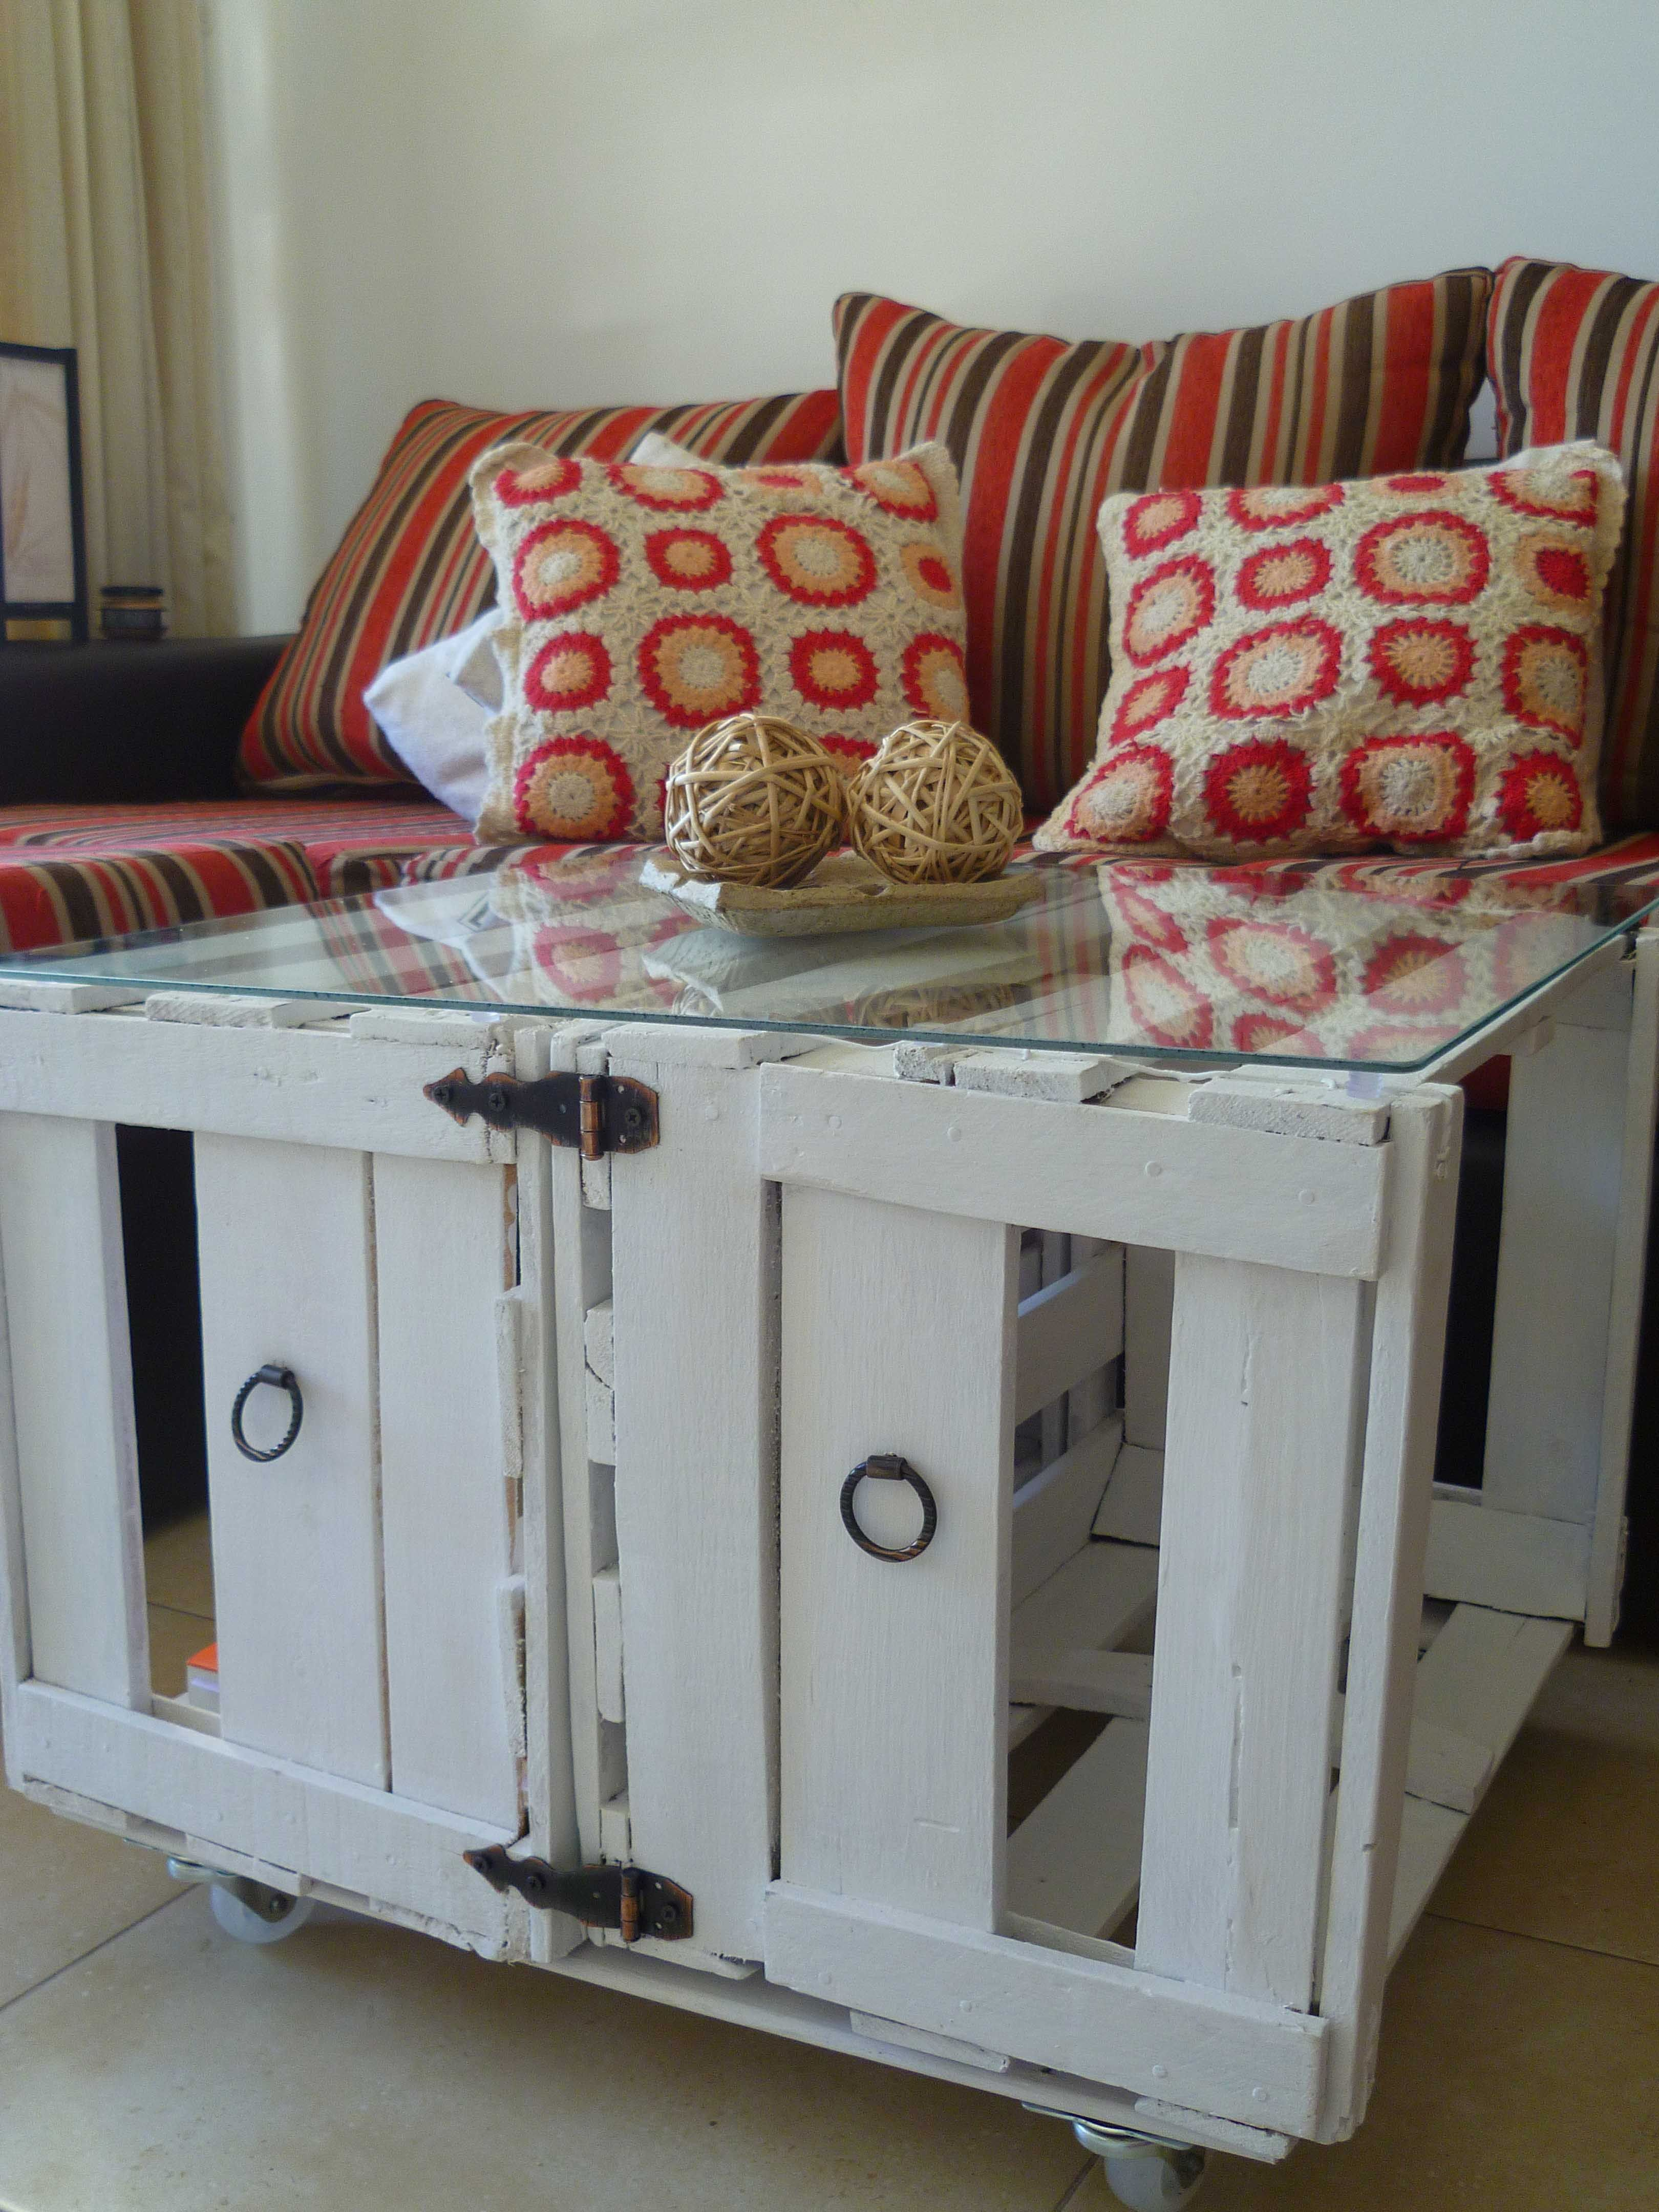 Muebles reciclados on pinterest crates tire ottoman and - Como decorar fotos ...